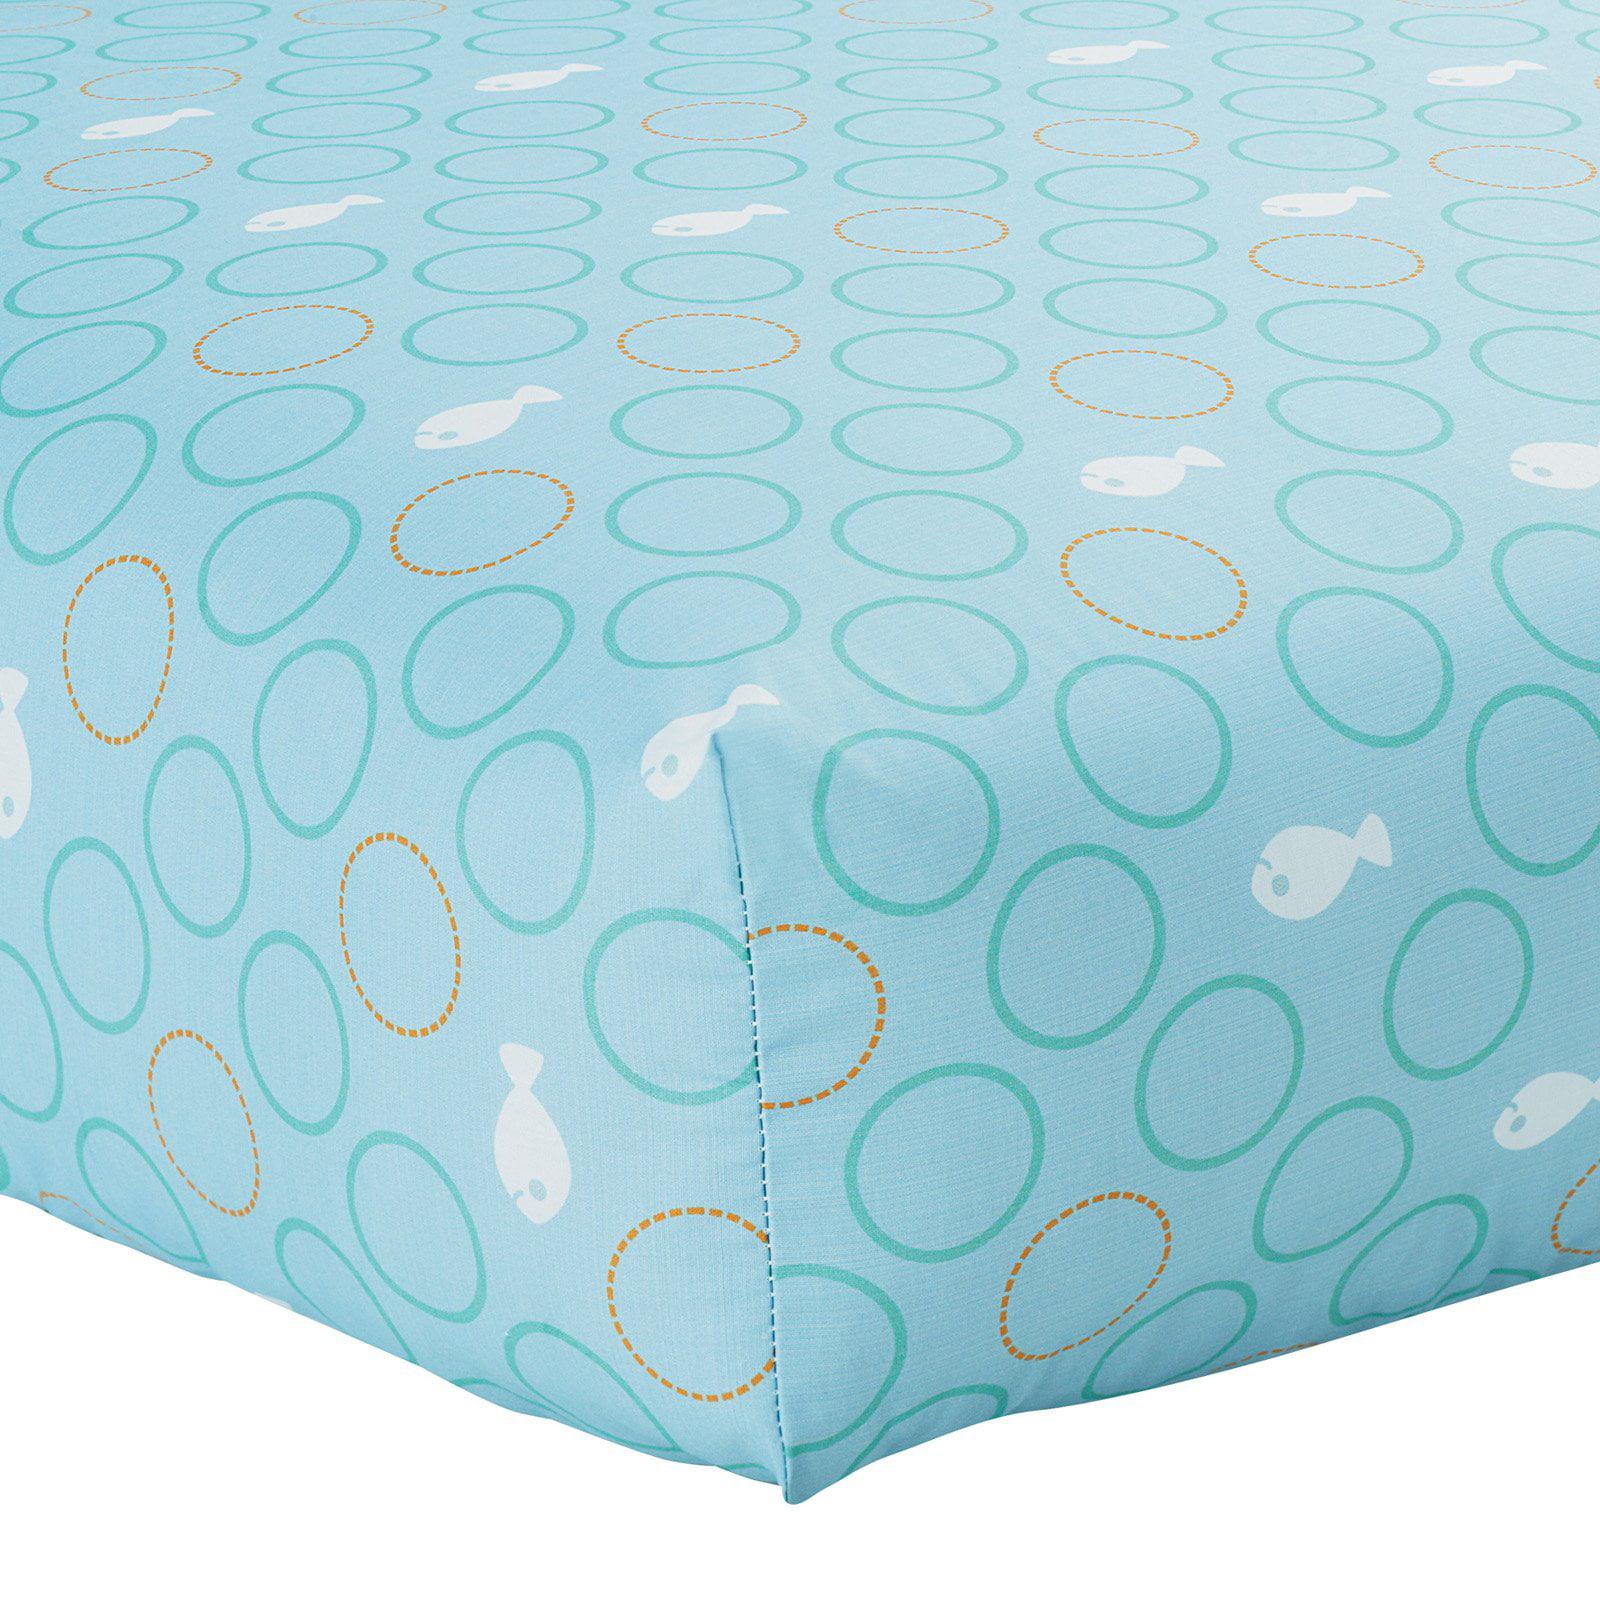 Nemo s reef 4 piece crib bedding set disney baby - Nemo S Reef 4 Piece Crib Bedding Set Disney Baby 51